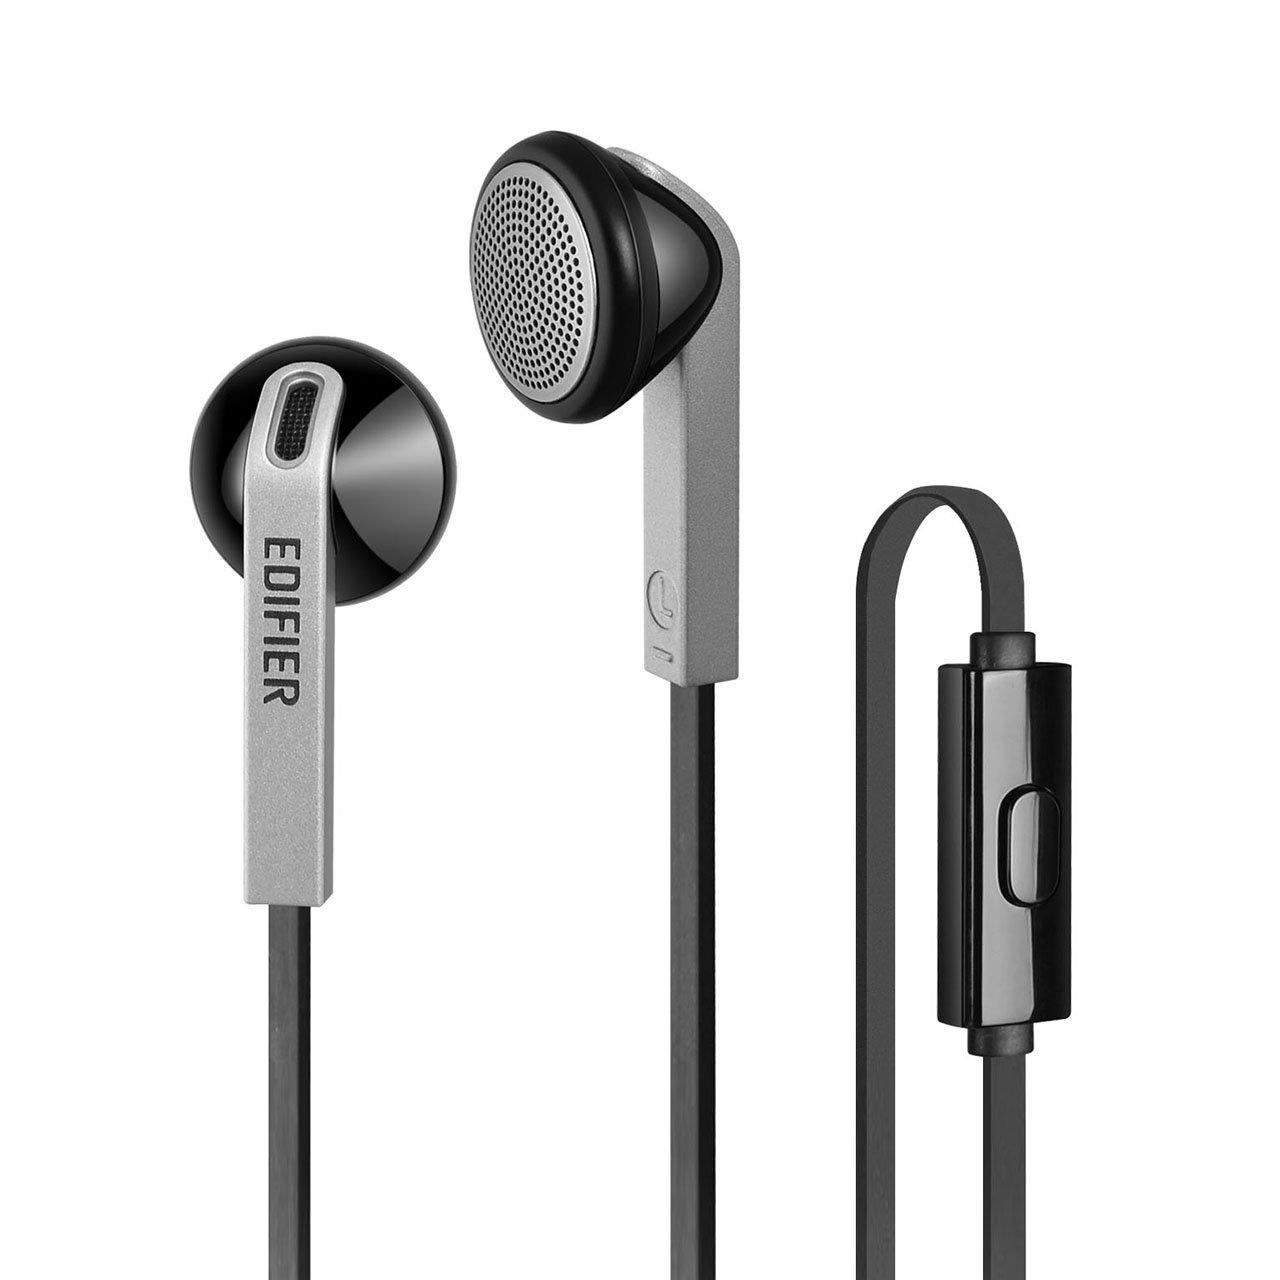 Edifier P190 Premium Earbuds Headset - Hi-Fi Classic Earbud Style Headphones - Comfortable Fit Earphones With Microphone - Black